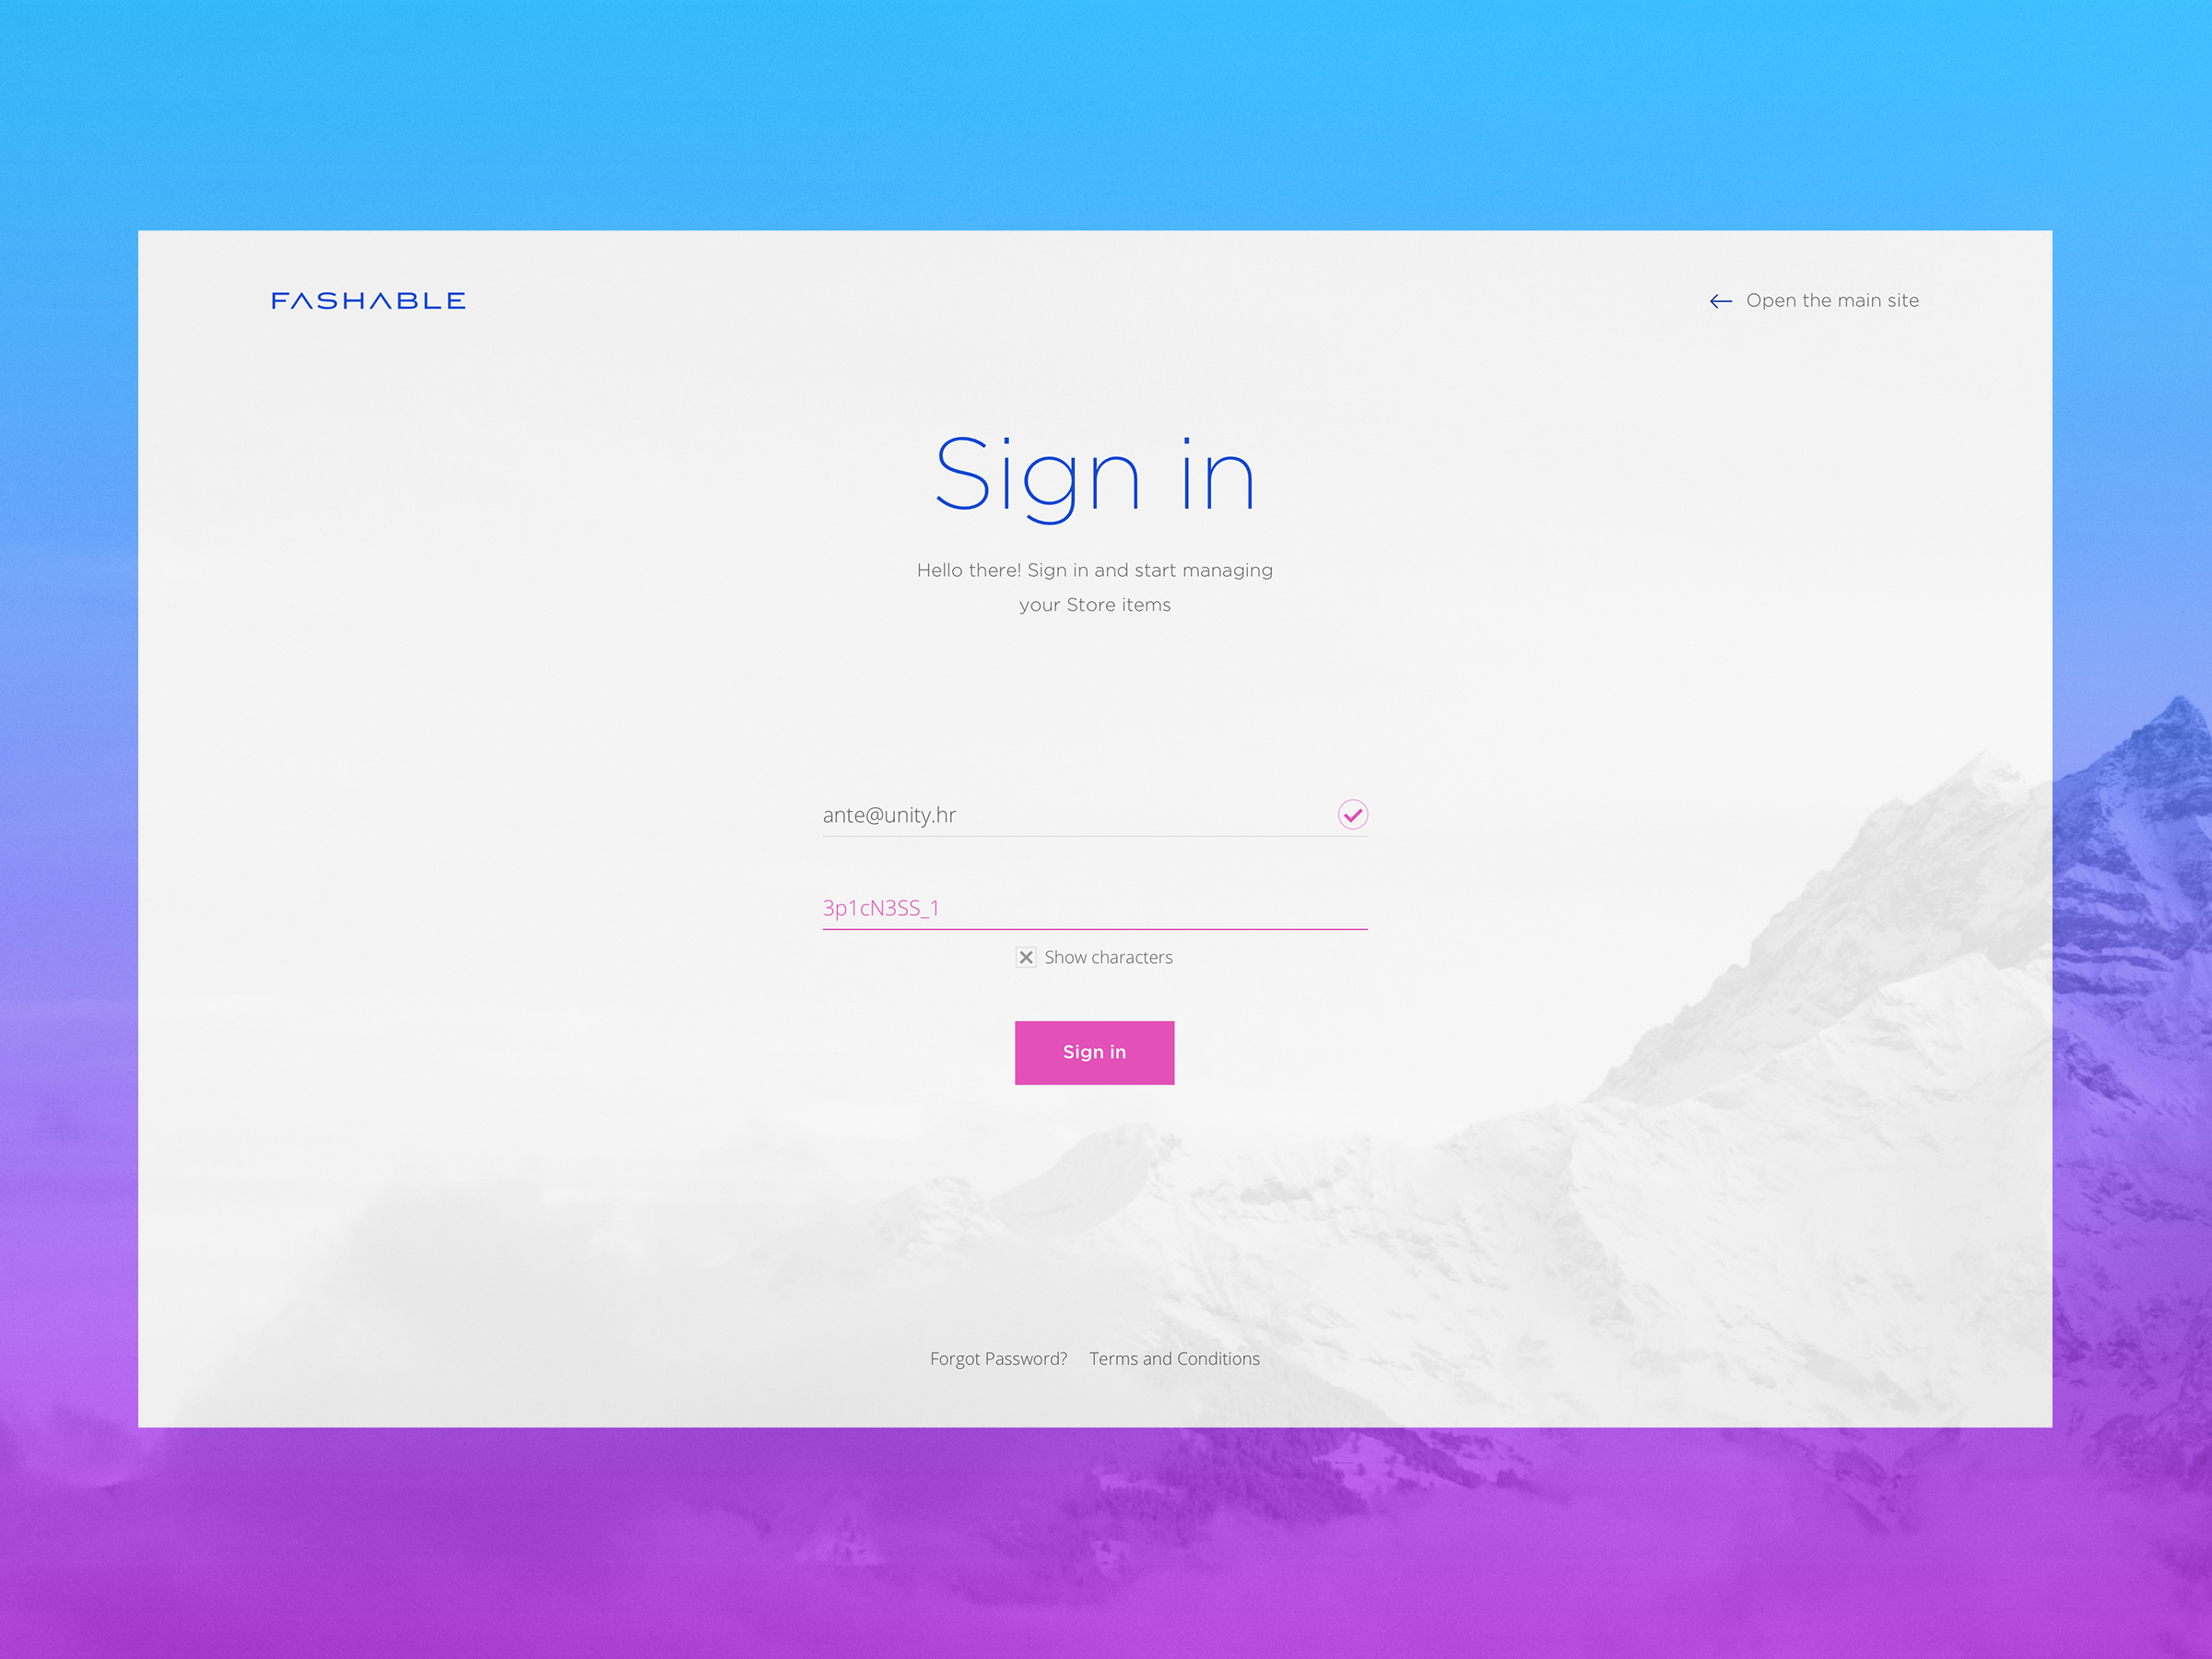 Sign In Full Png By Ante Matijaca Login Page Design Web Design Login Design